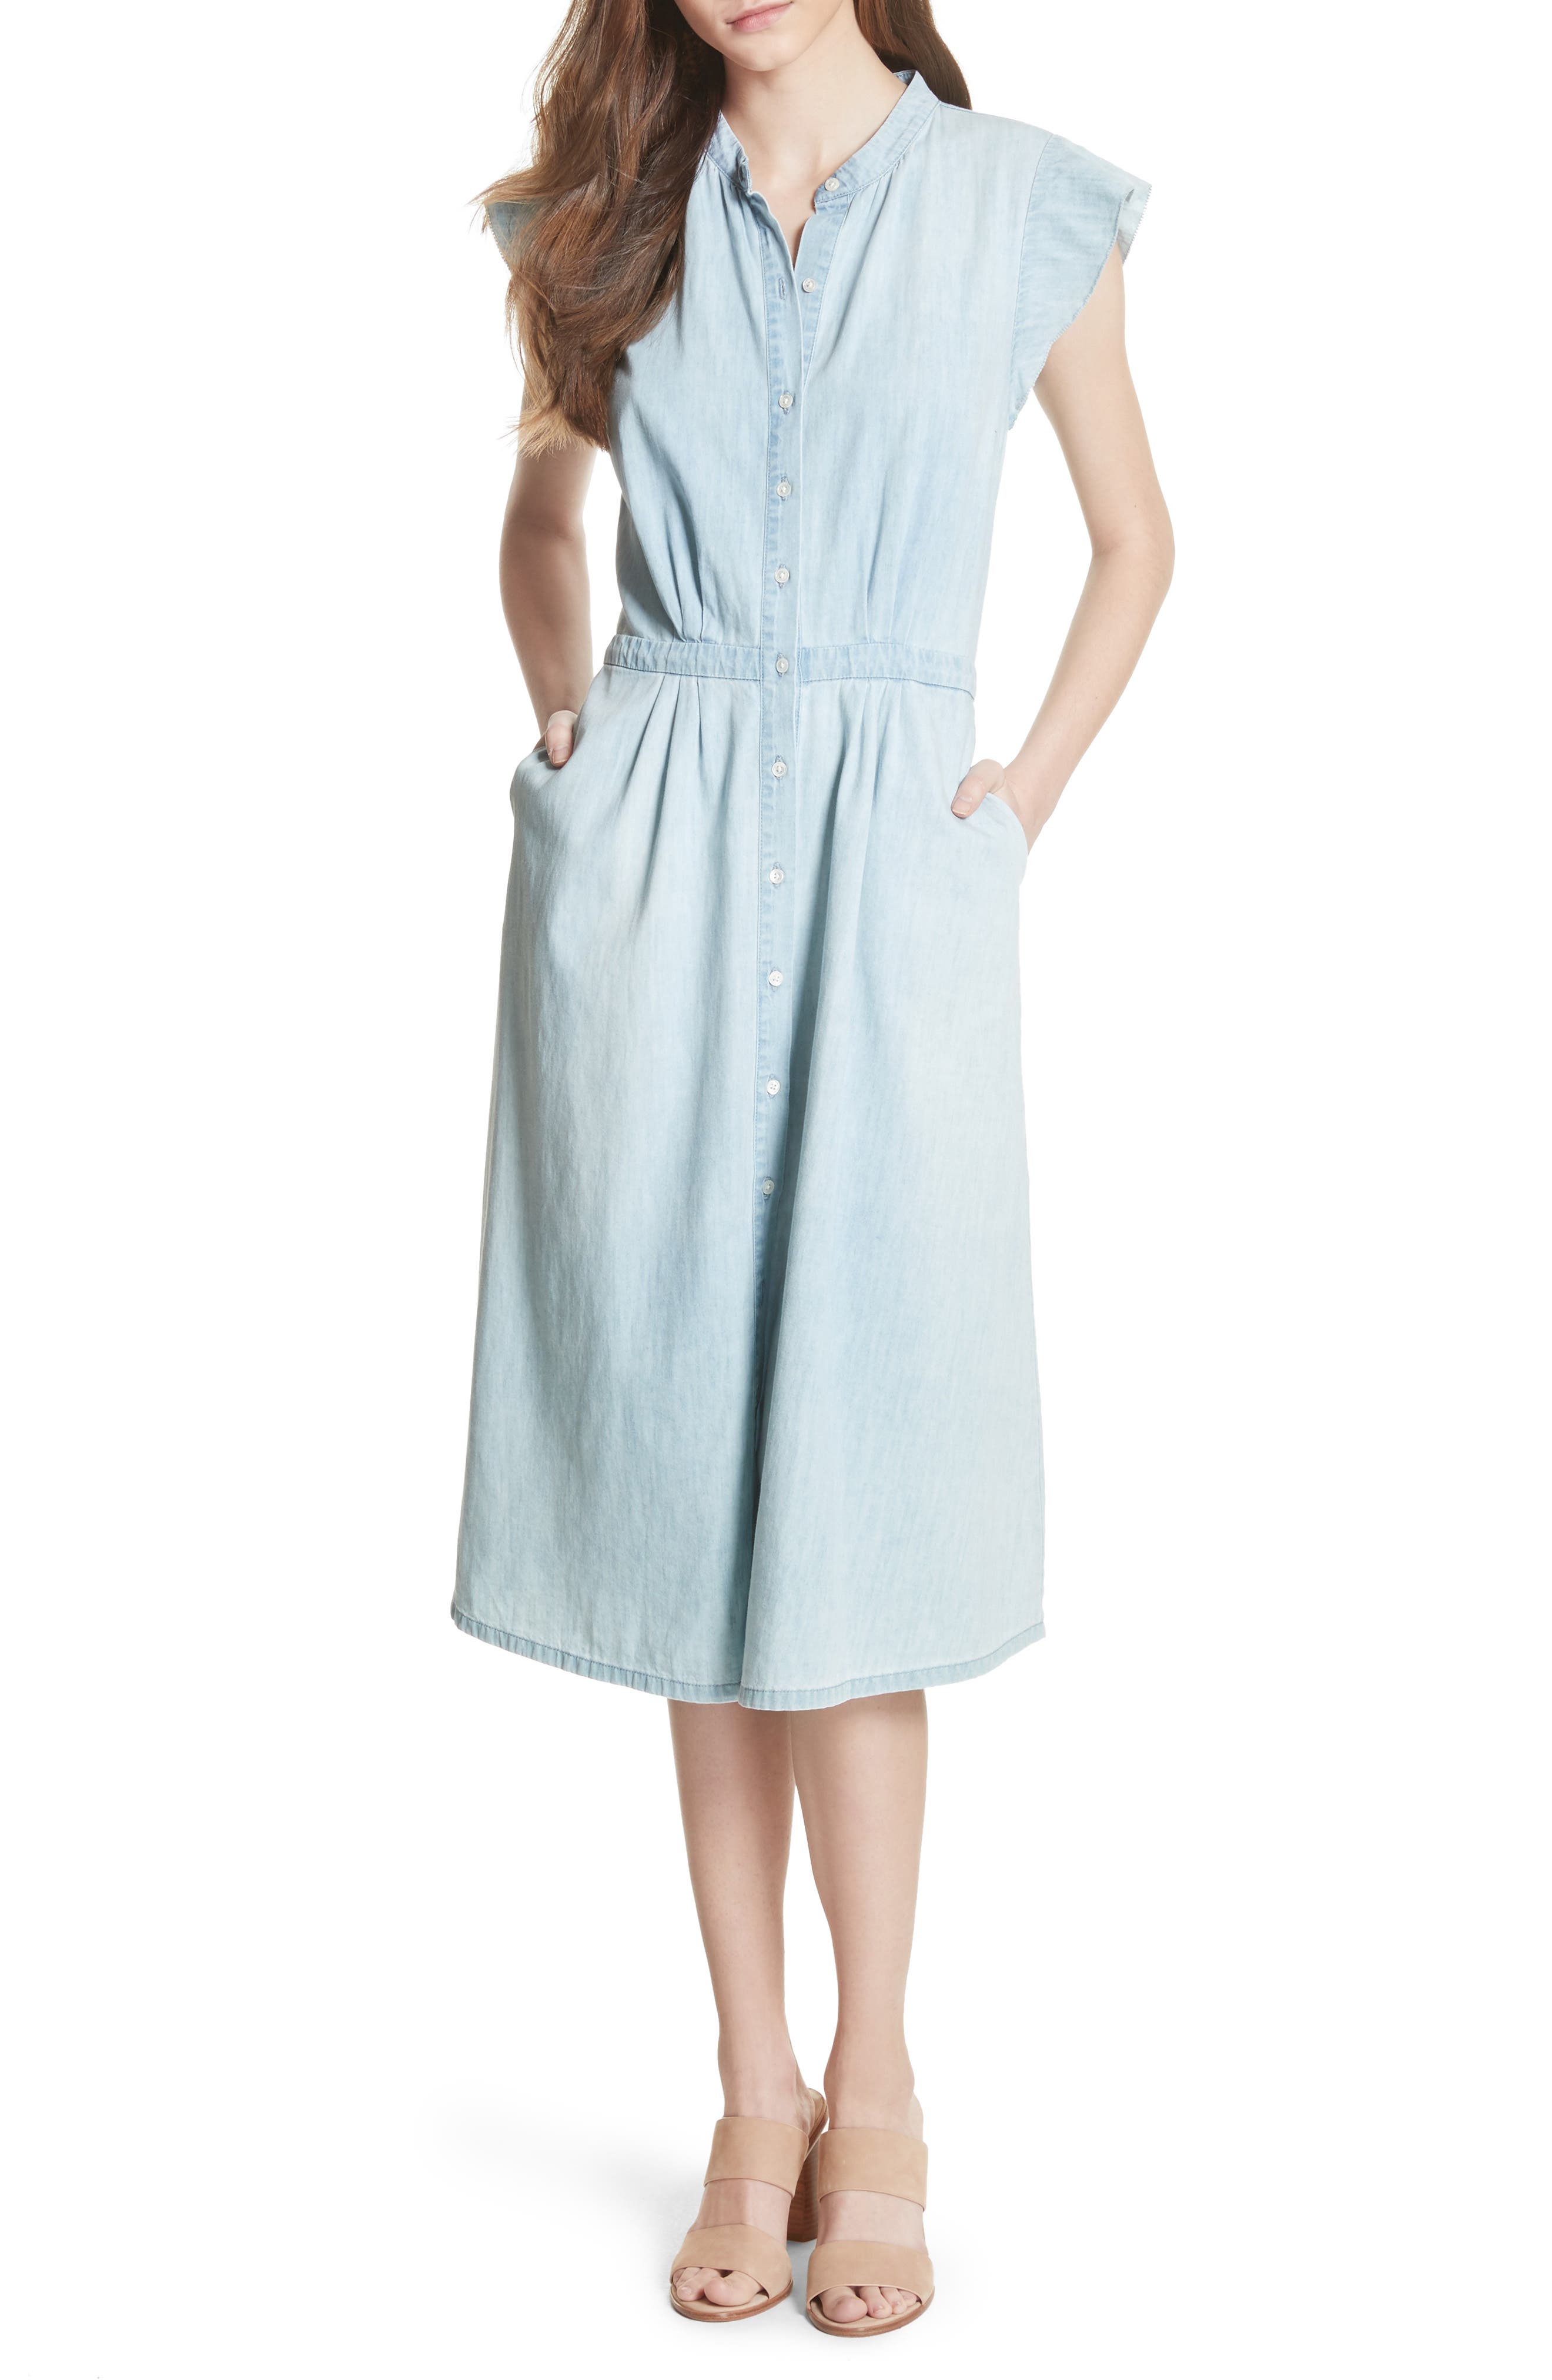 Awel Ruffle Chambray Shirtdress,                         Main,                         color, Western Fade